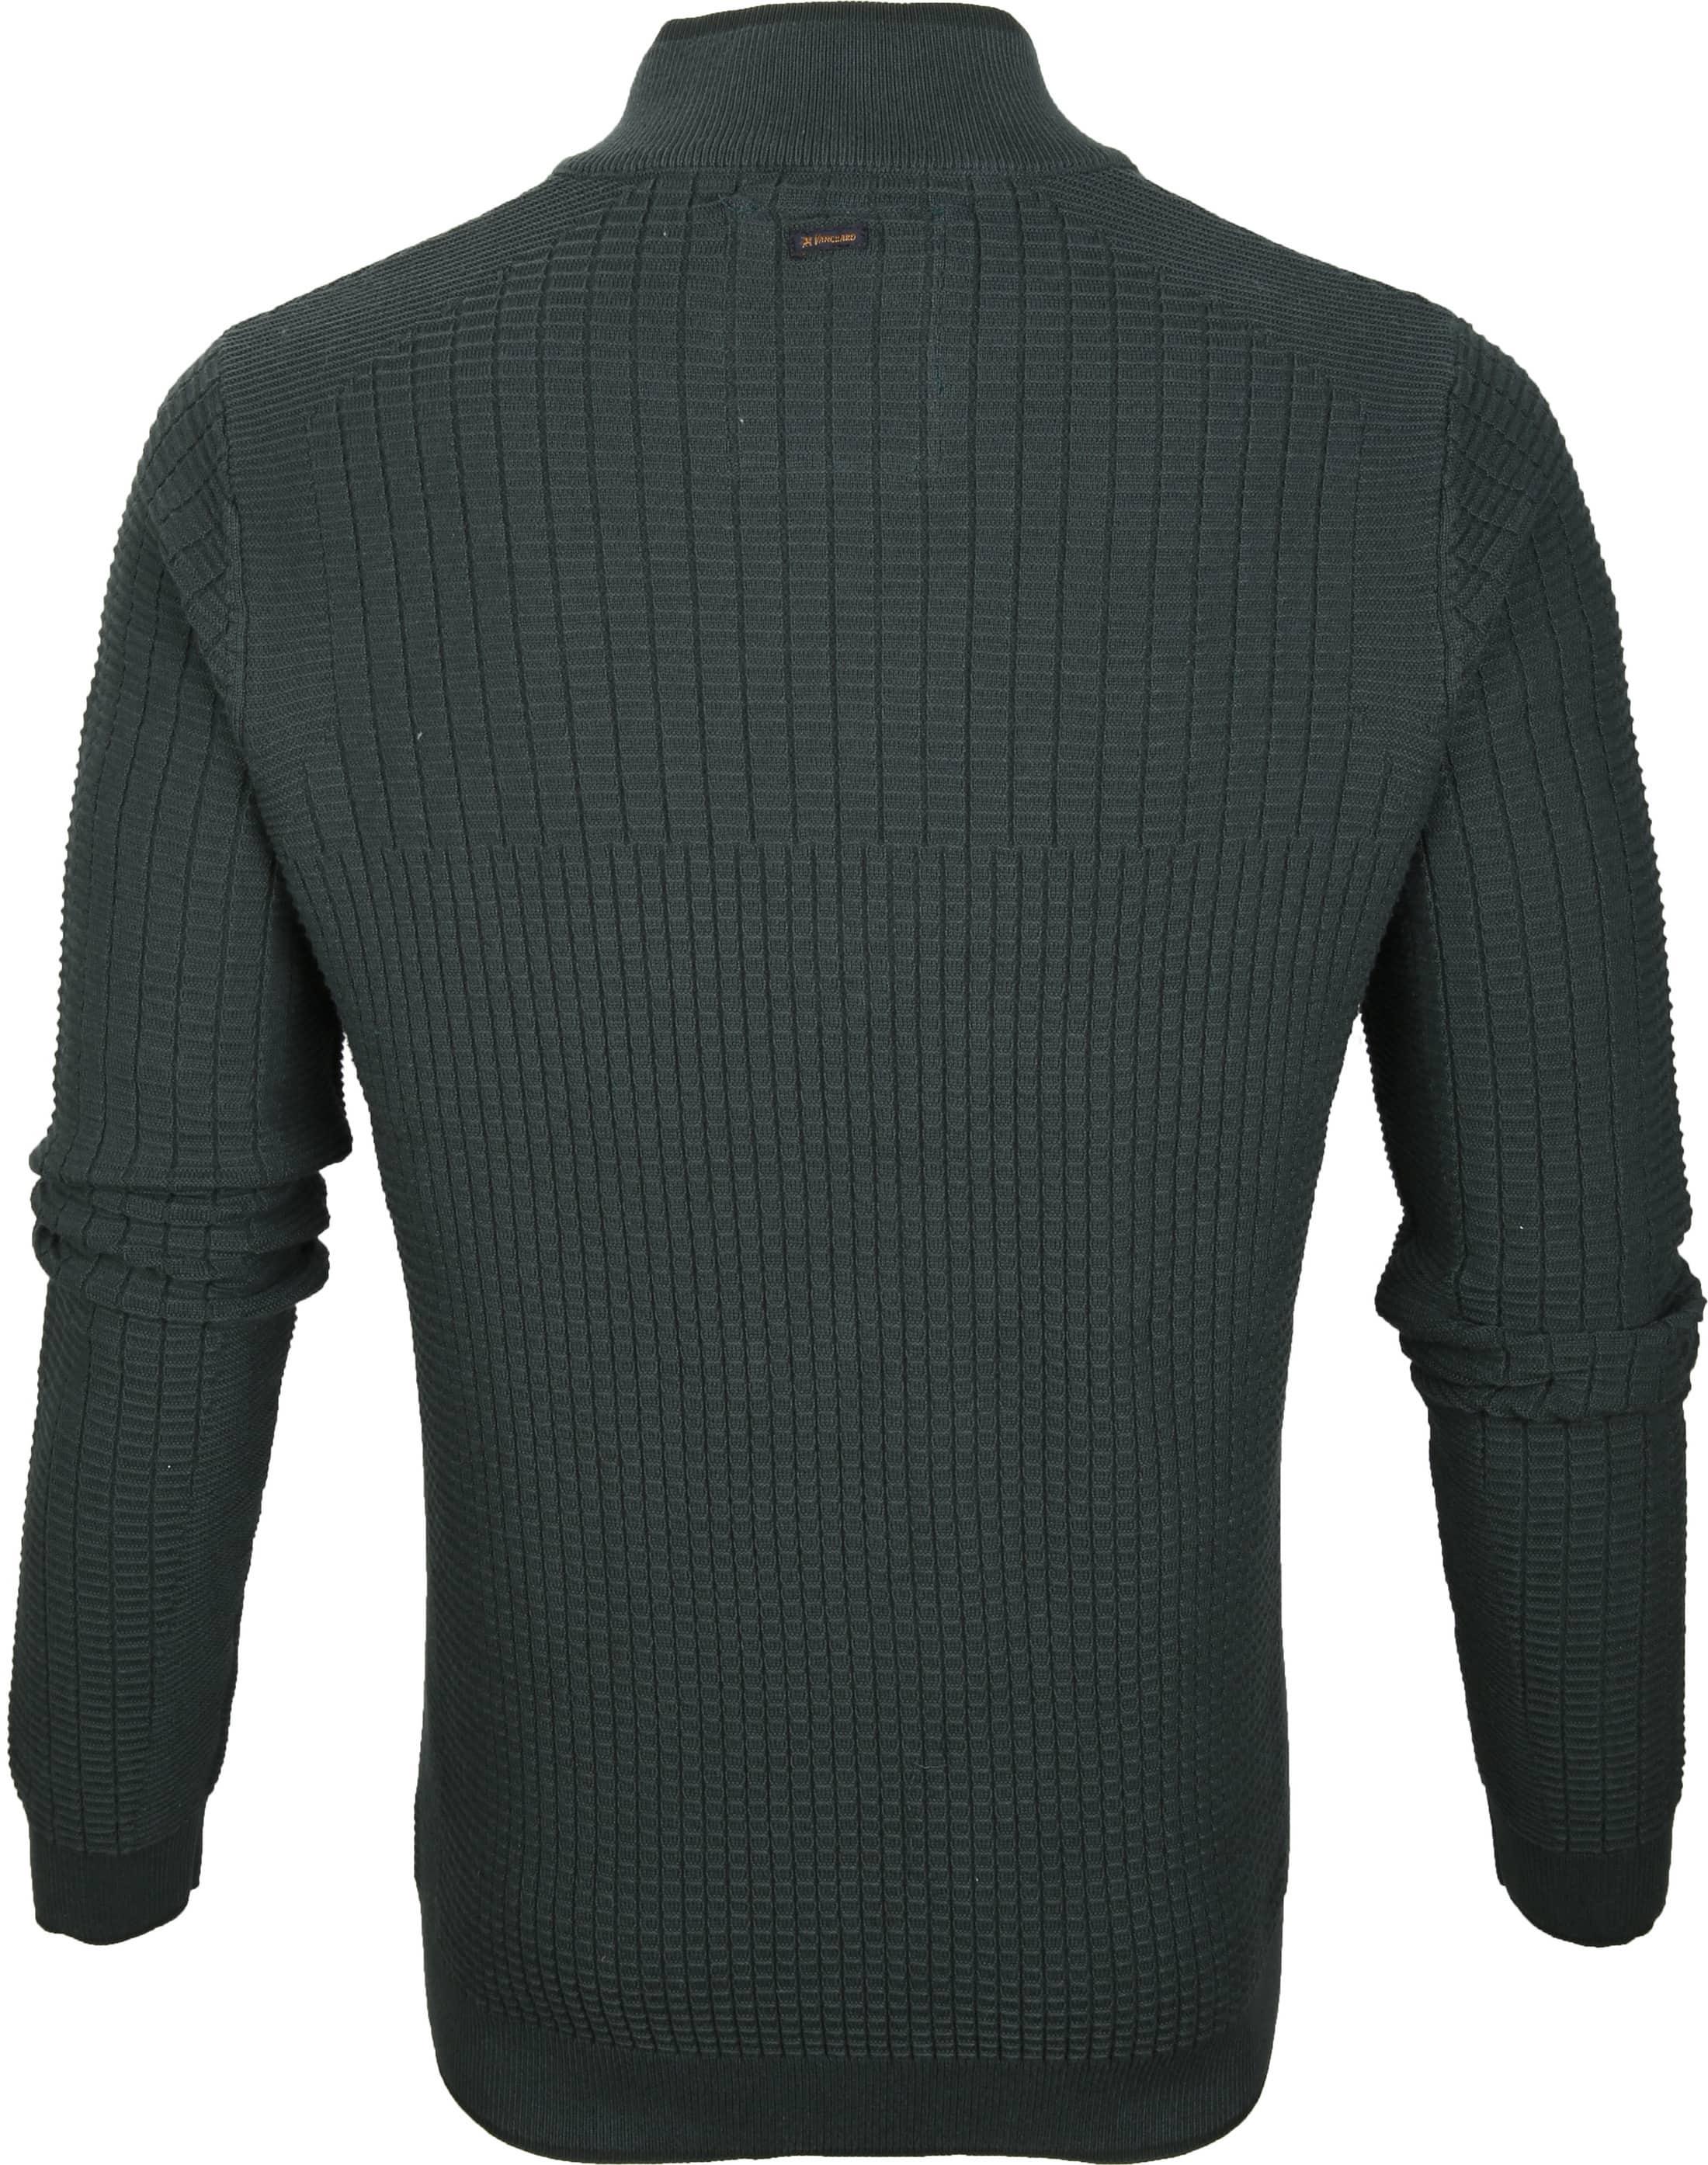 Vanguard Pullover Zipper Dark Green foto 3